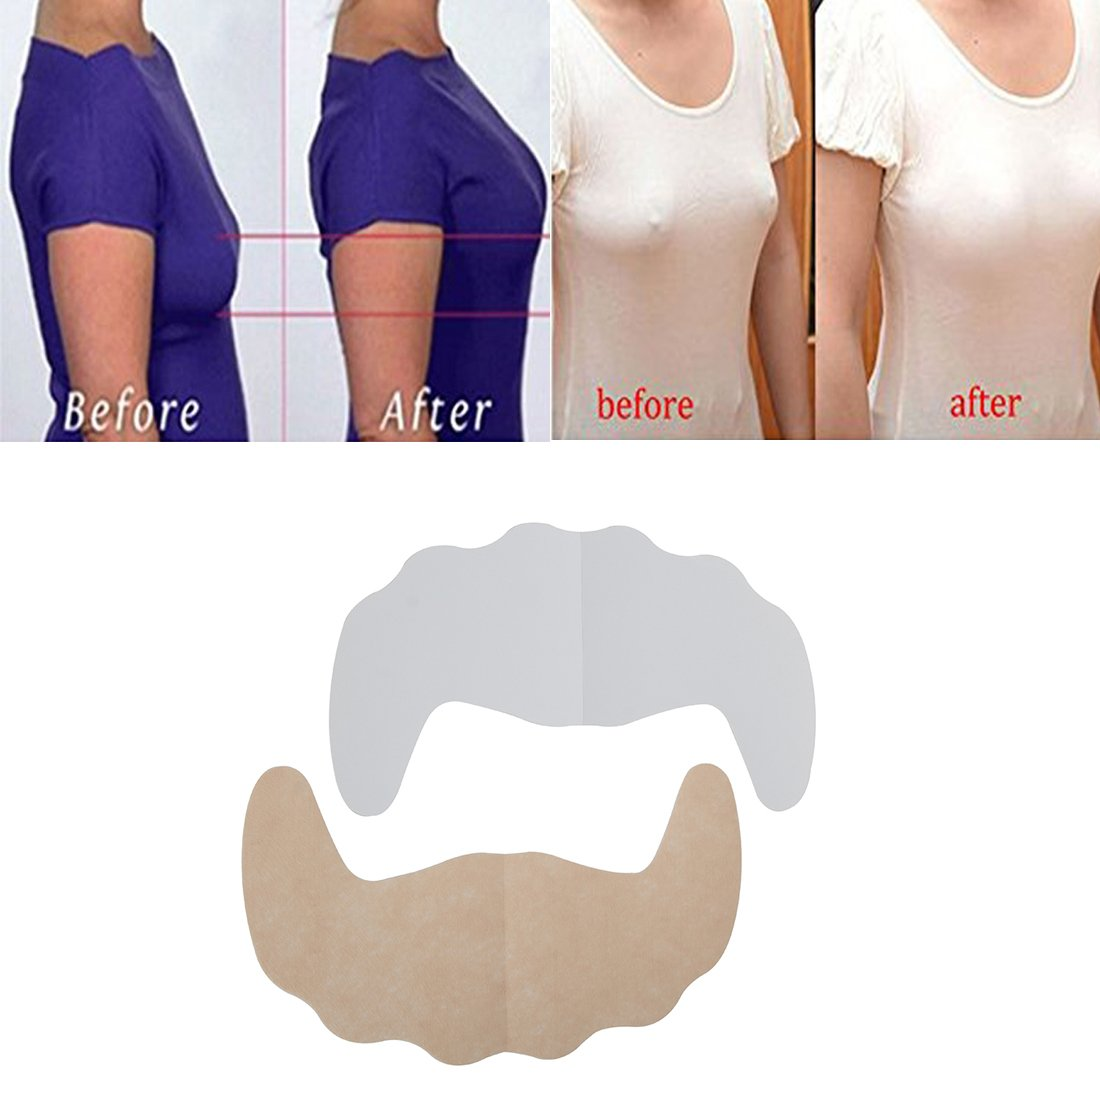 Careonline Adhesive Bra,Breast Petals Disposable Push Up Bra Nipple Covers Bra 10PCS